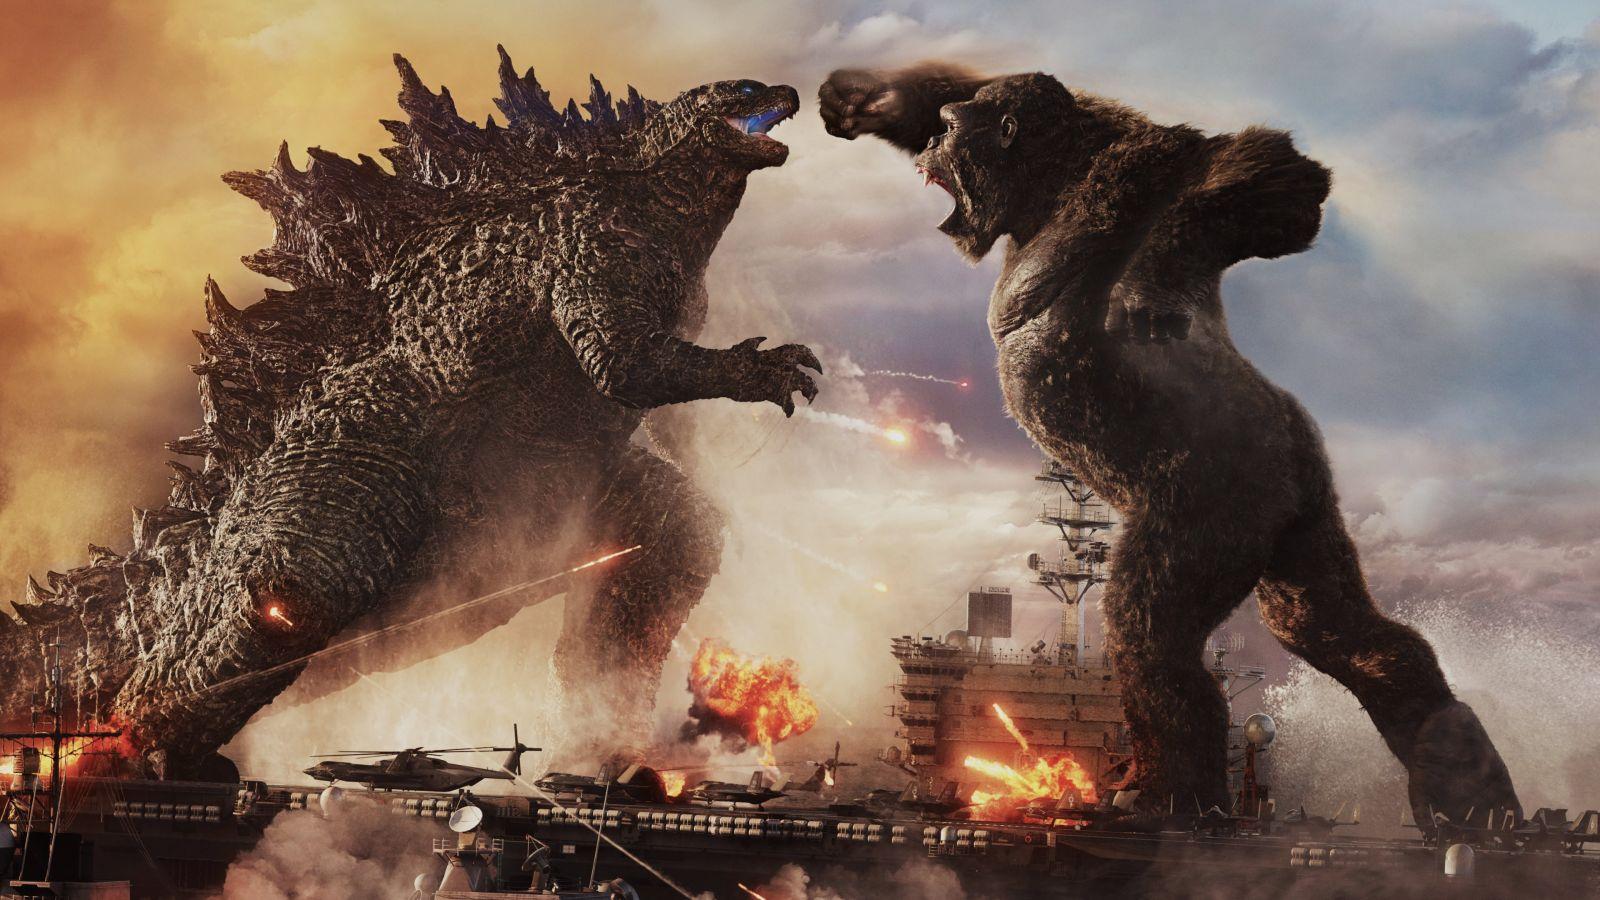 Godzilla vs Kong (2021) Full Movie HD 720P Watch Online Full Free